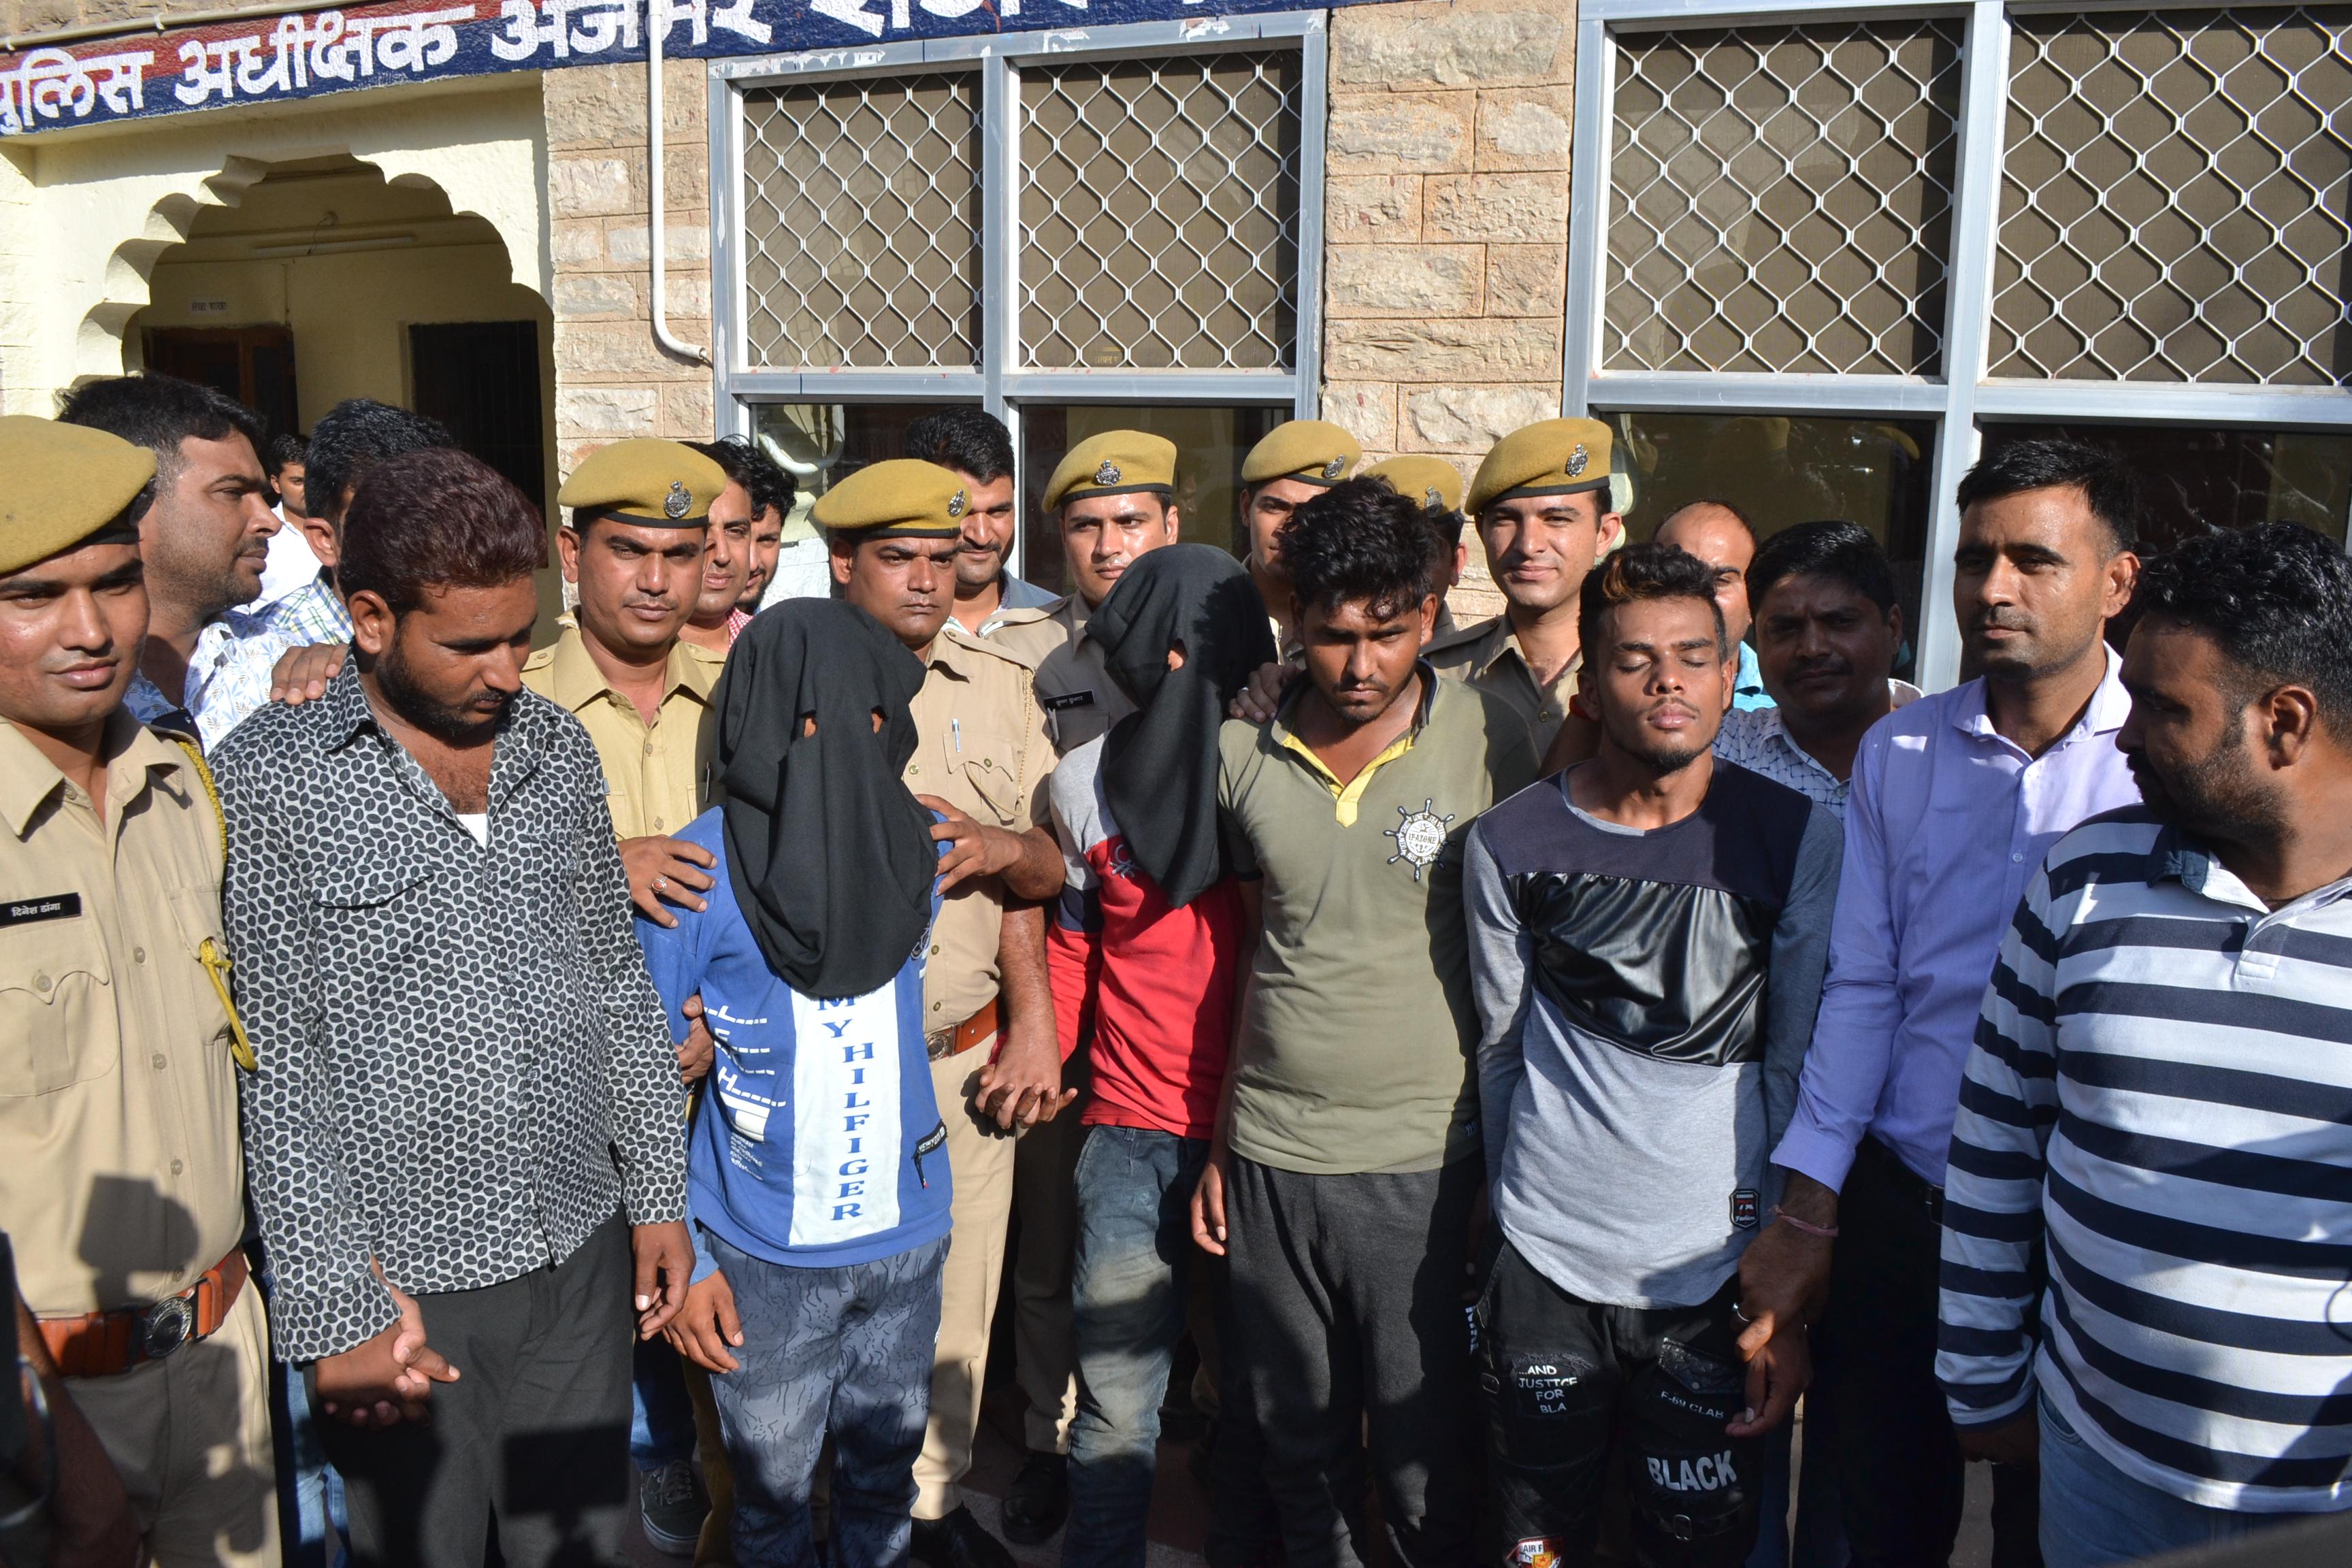 Beawar Rape Case : वकील साहब को दी सोशल मीडिया पर धमकी